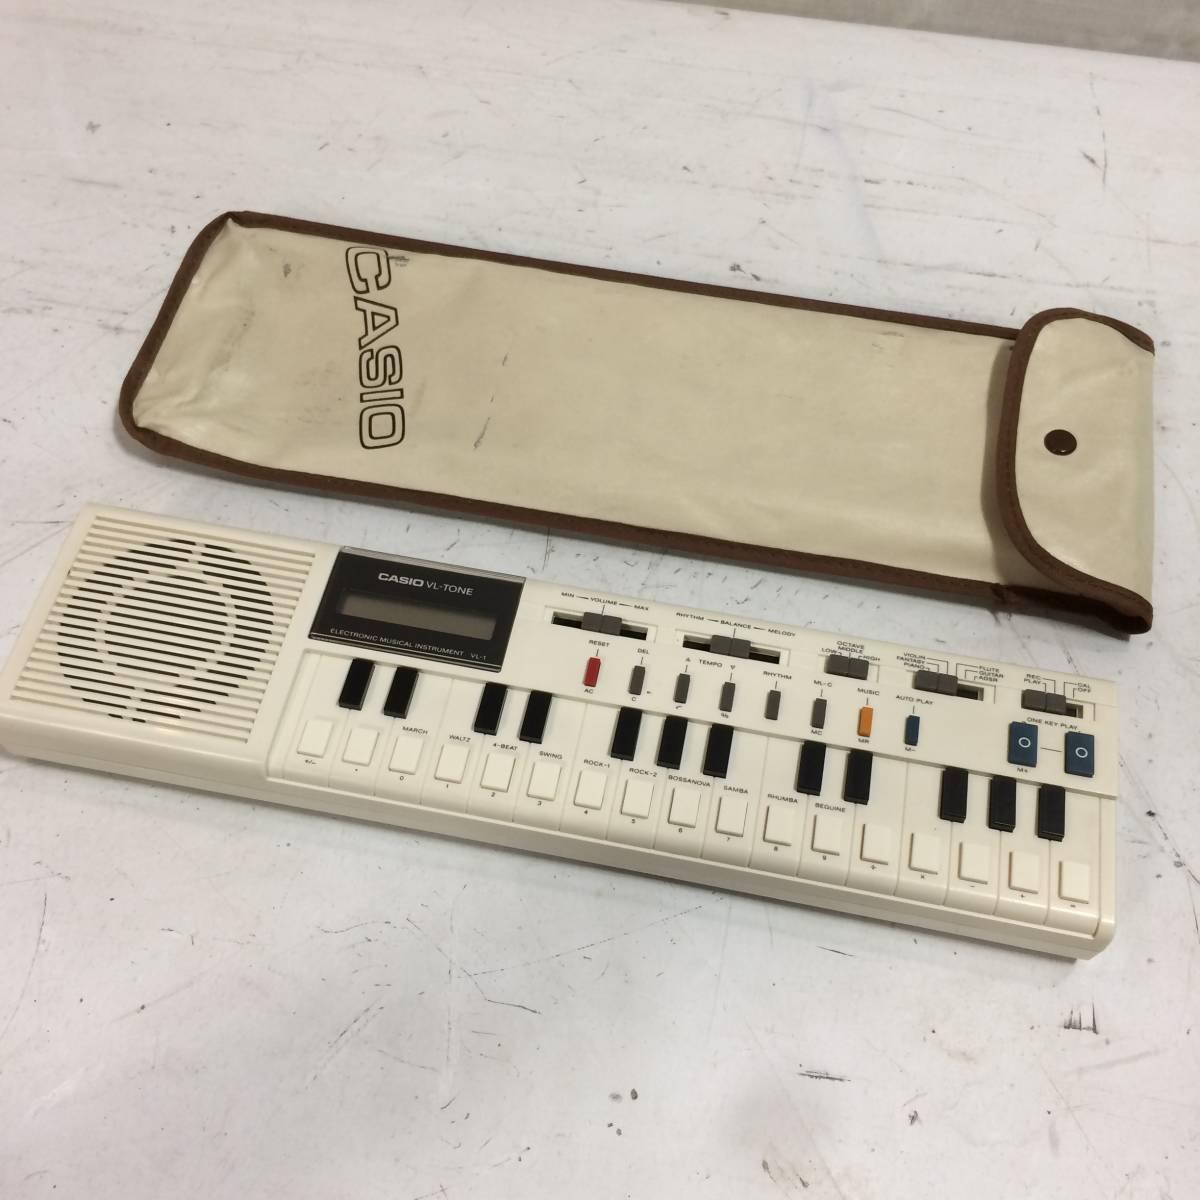 CASIO VL-TONE VL-1 キーボード 【中古品】